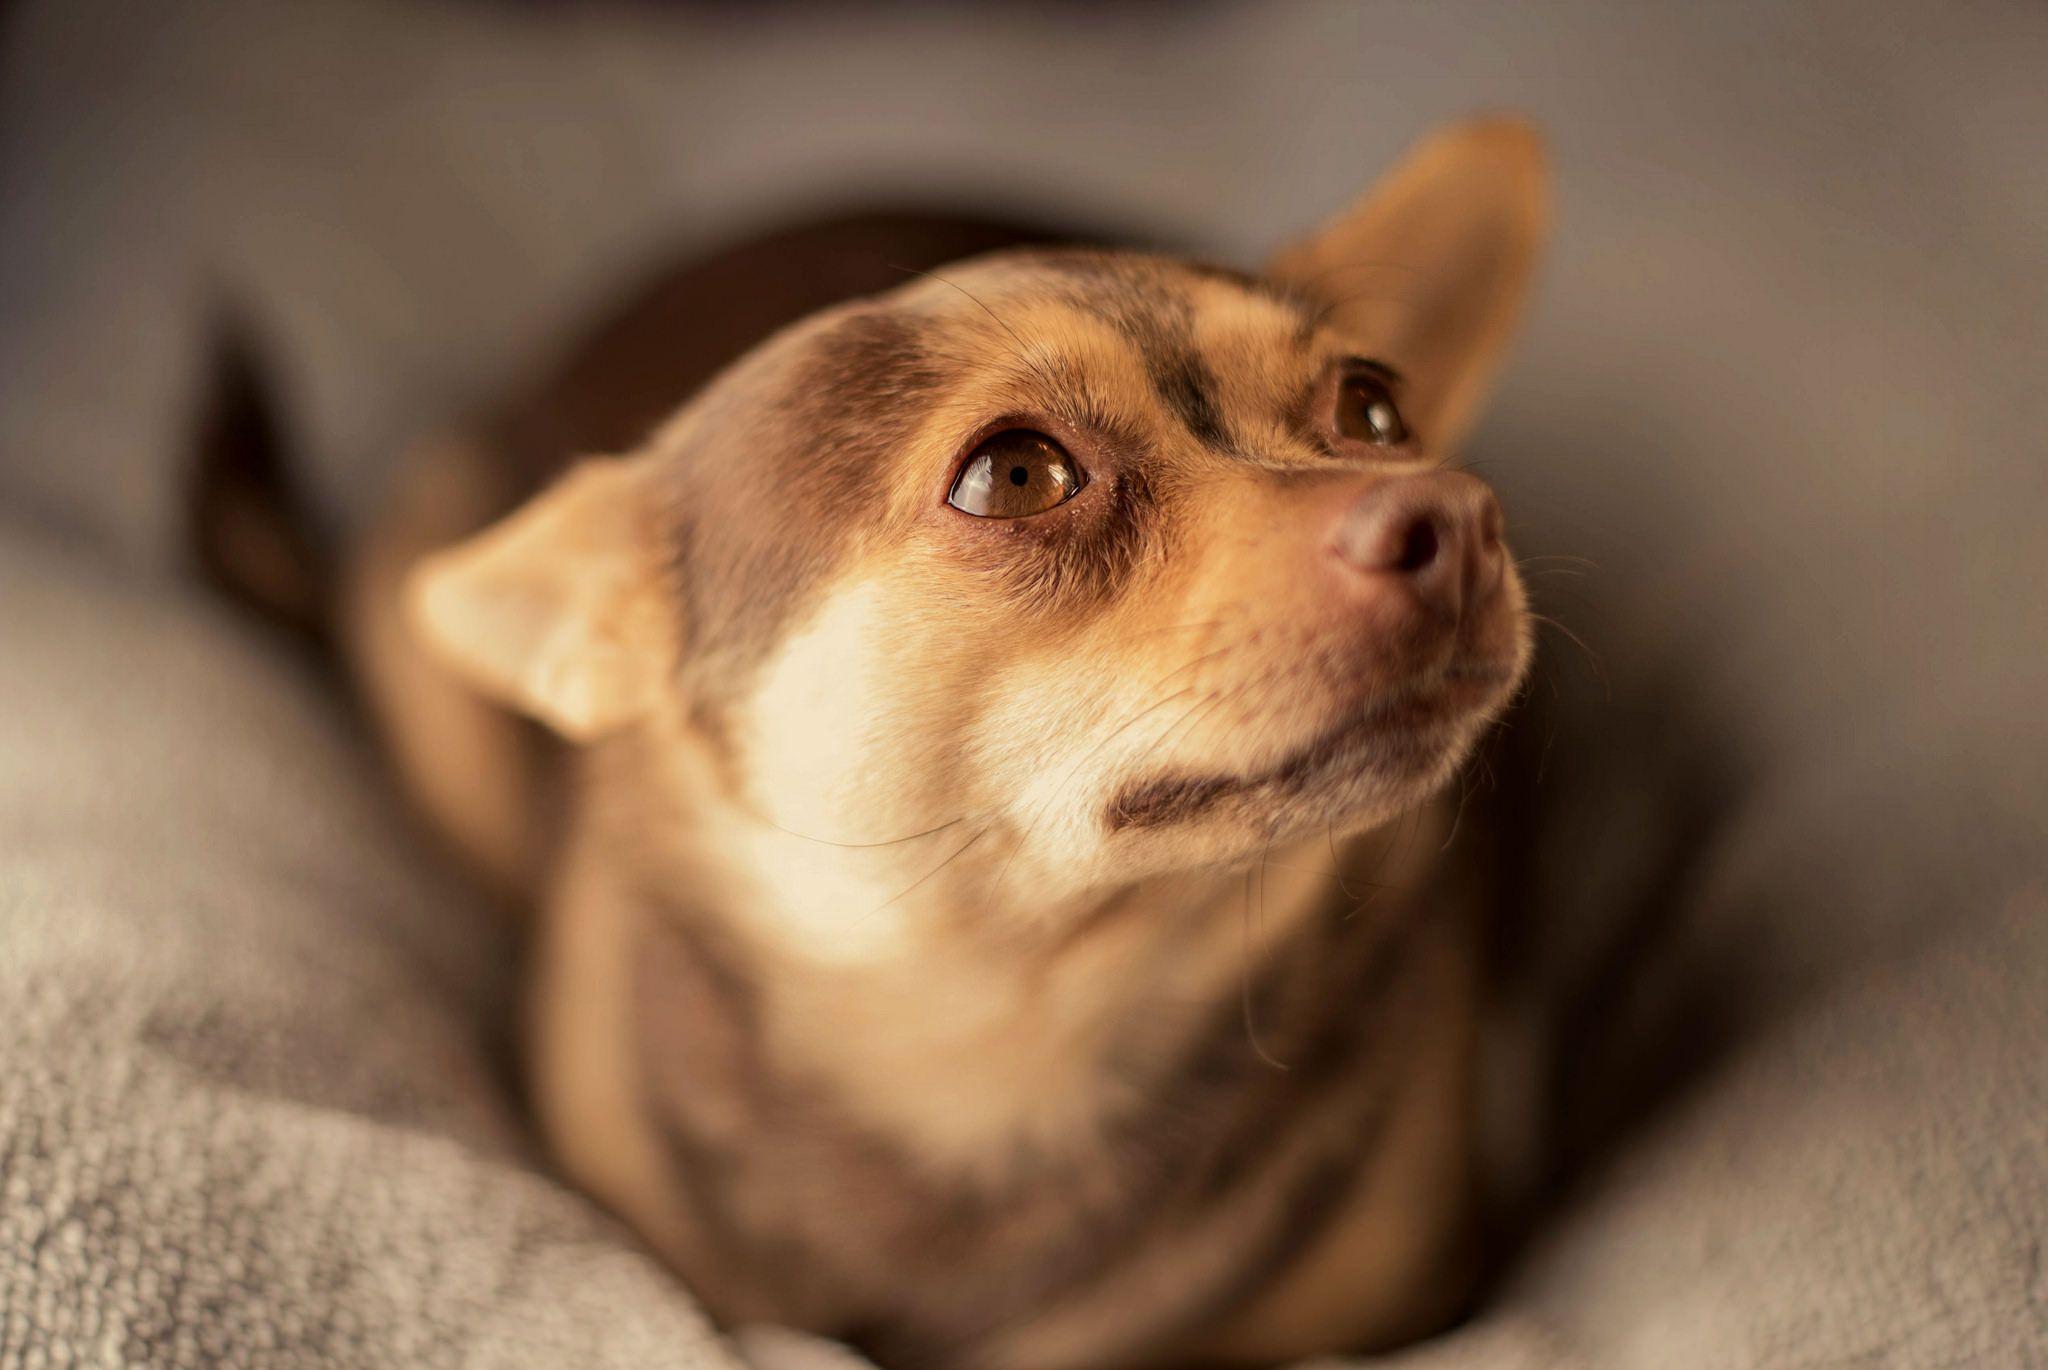 Innocent cute puppy iftfifhiv cute puppies pinterest